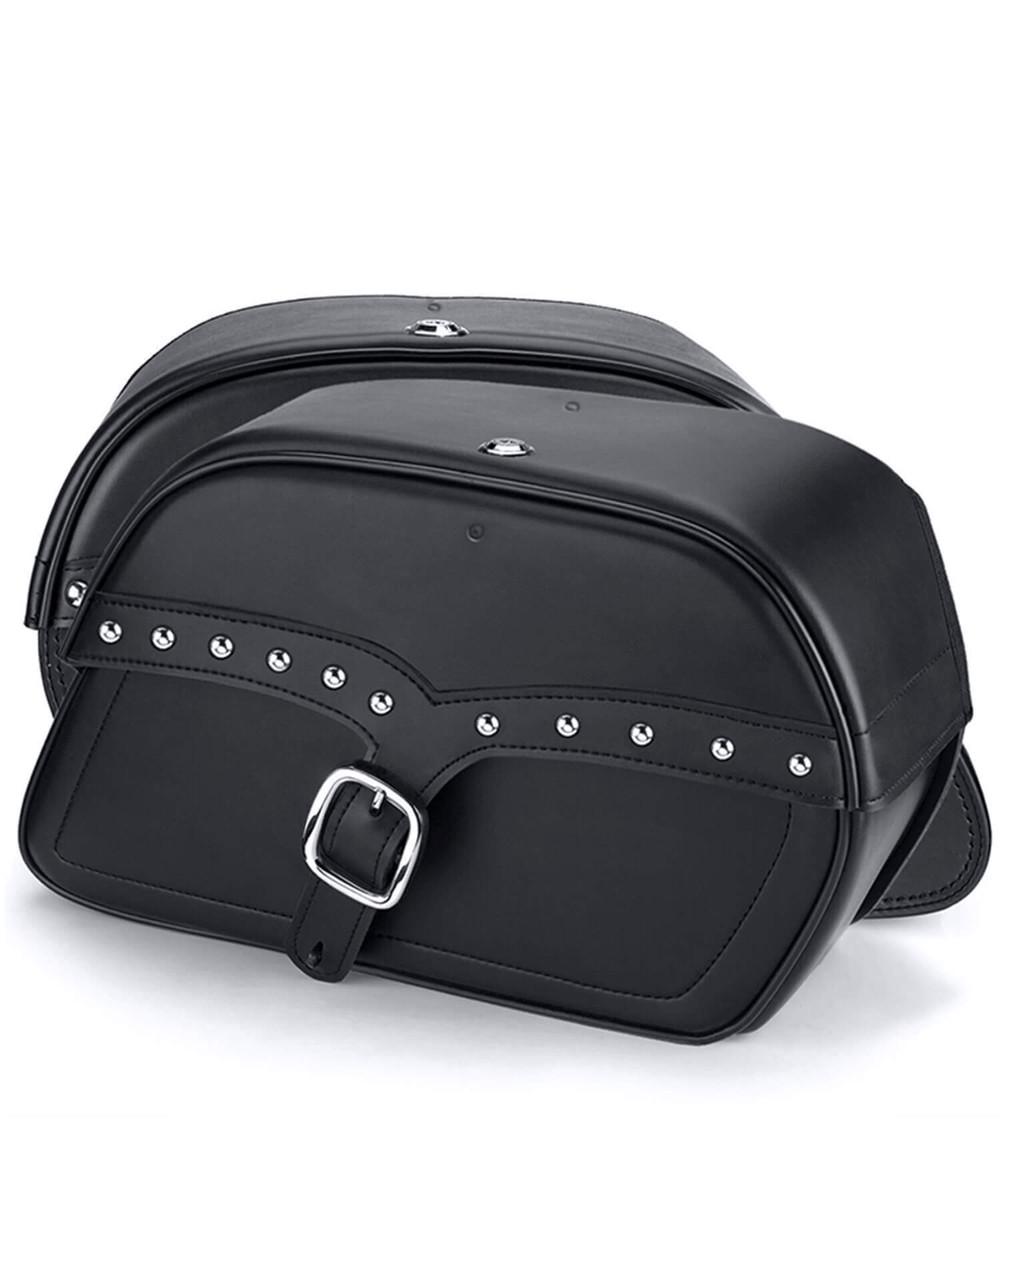 Honda VTX 1300 C Medium Charger Single Strap Studded Motorcycle Saddlebags Both Bags View